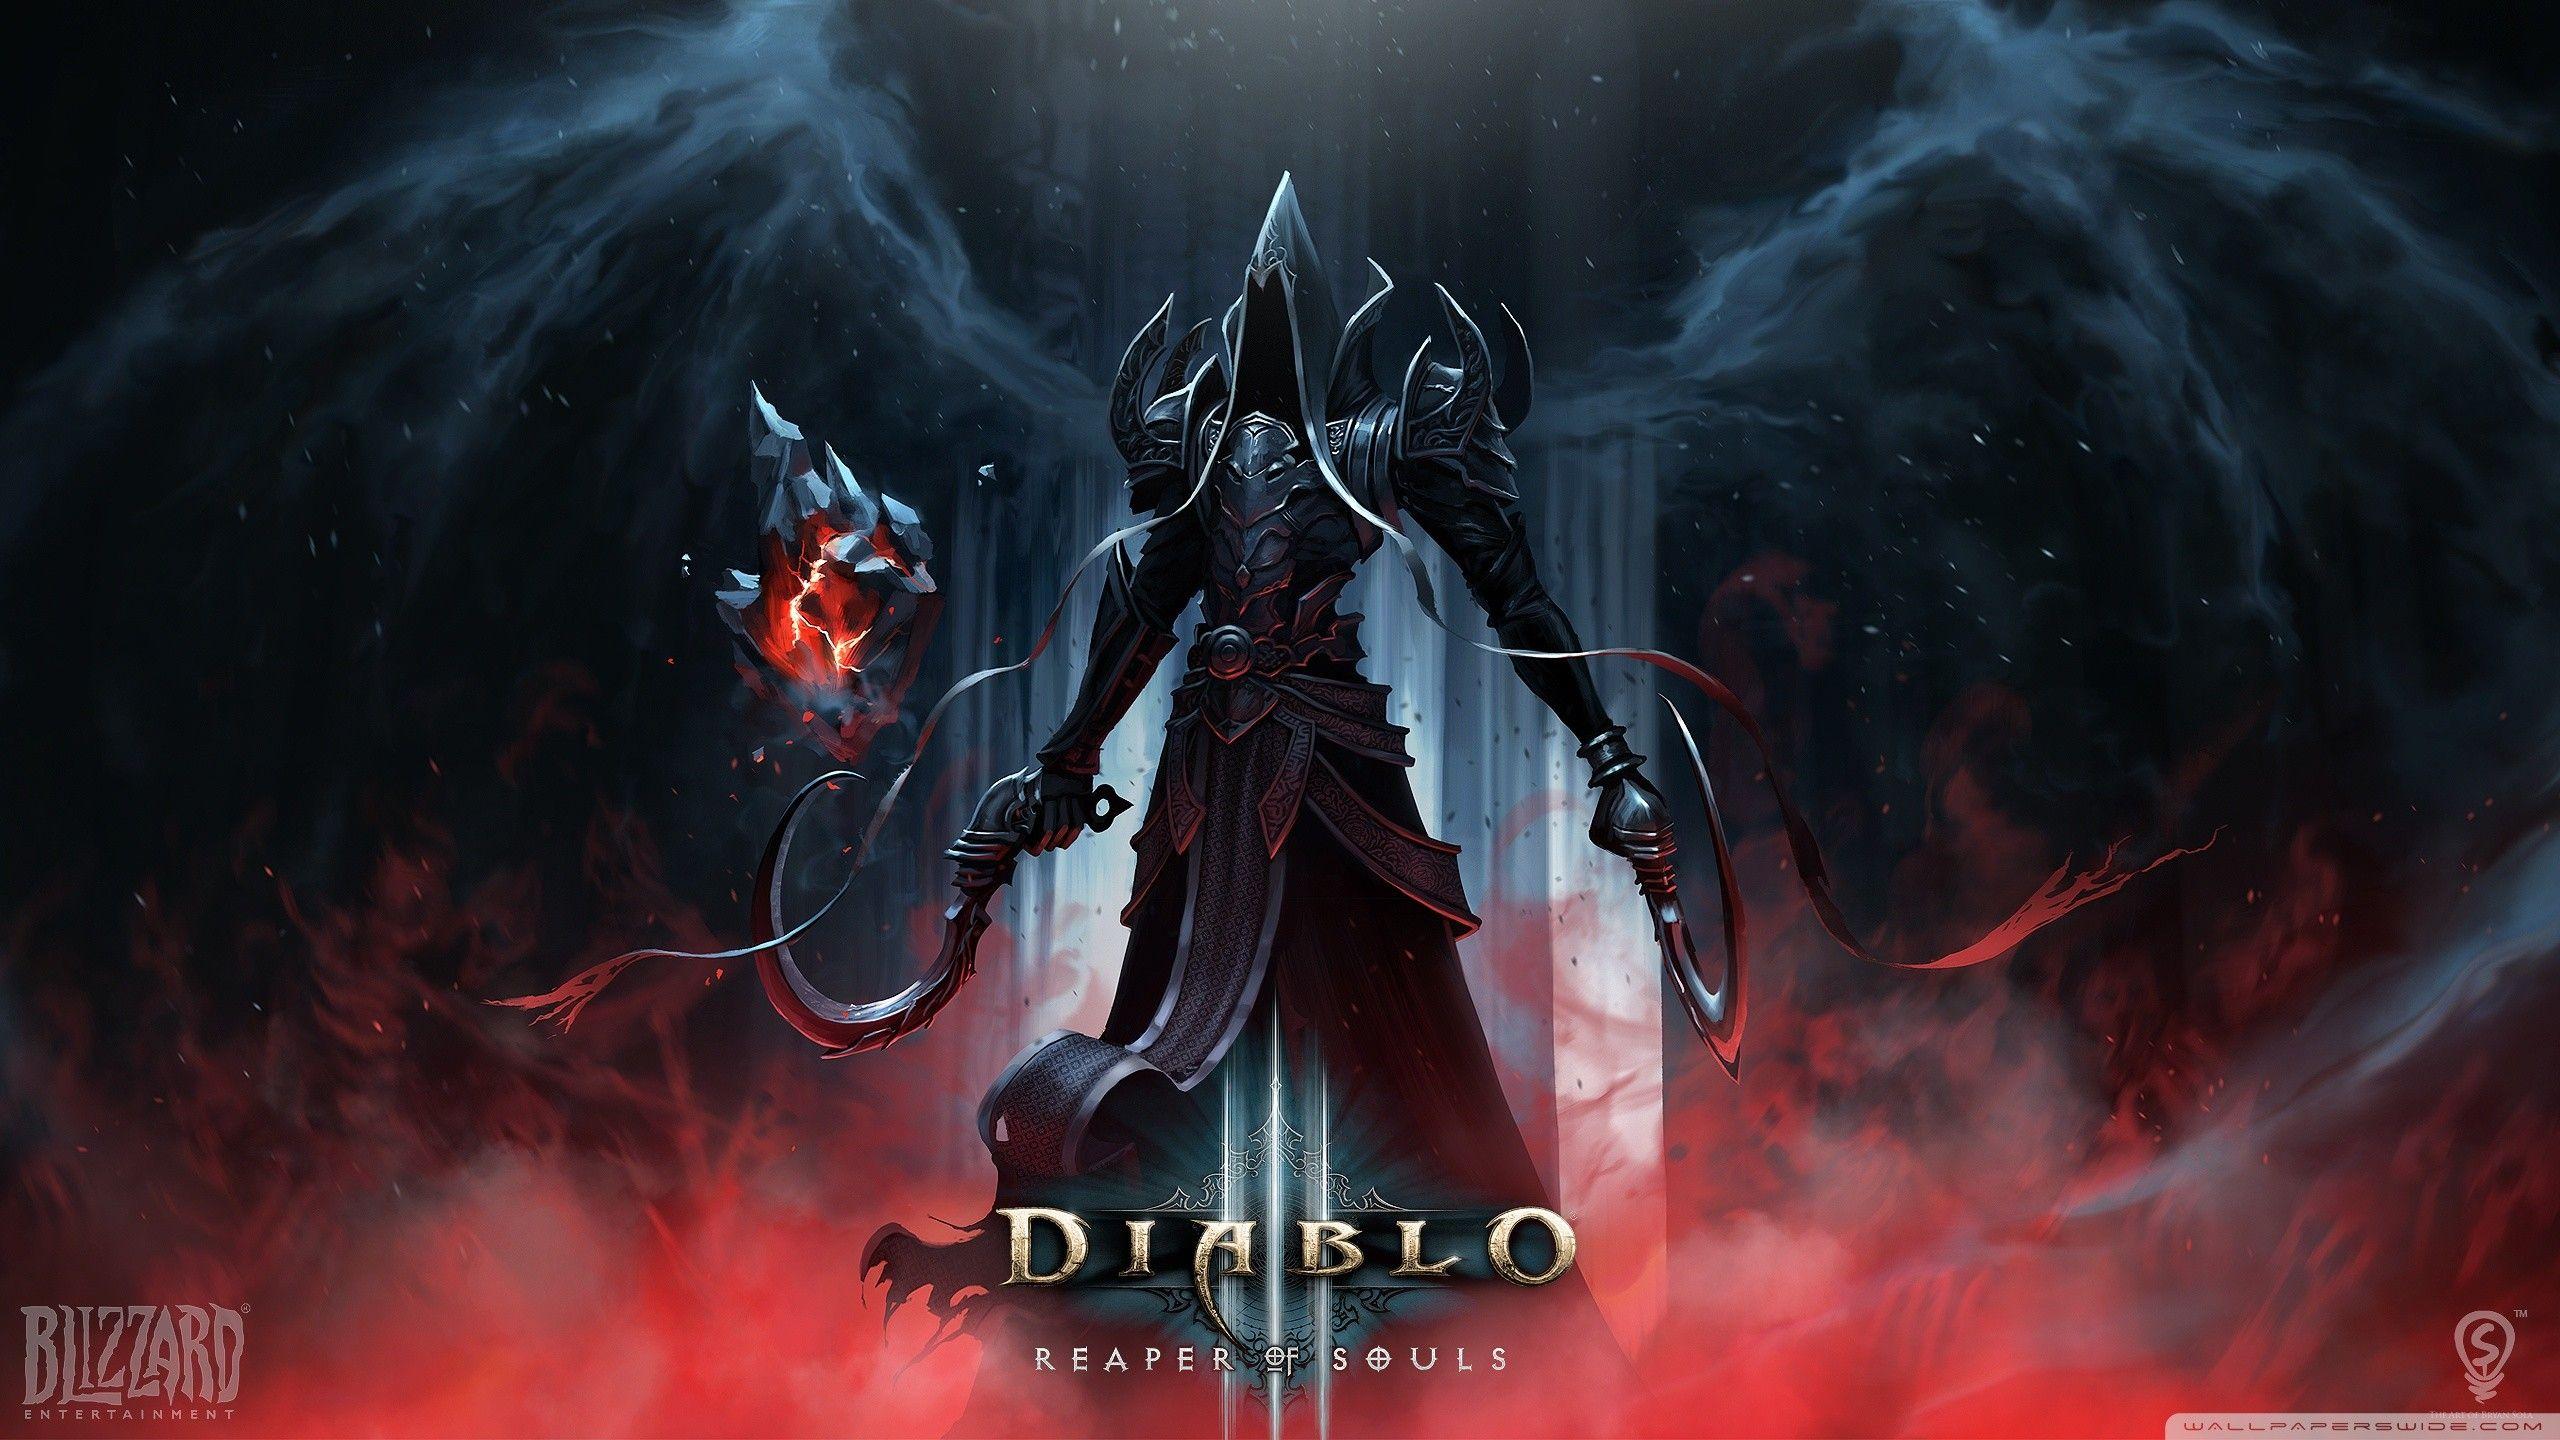 Diablo 3 download for mac